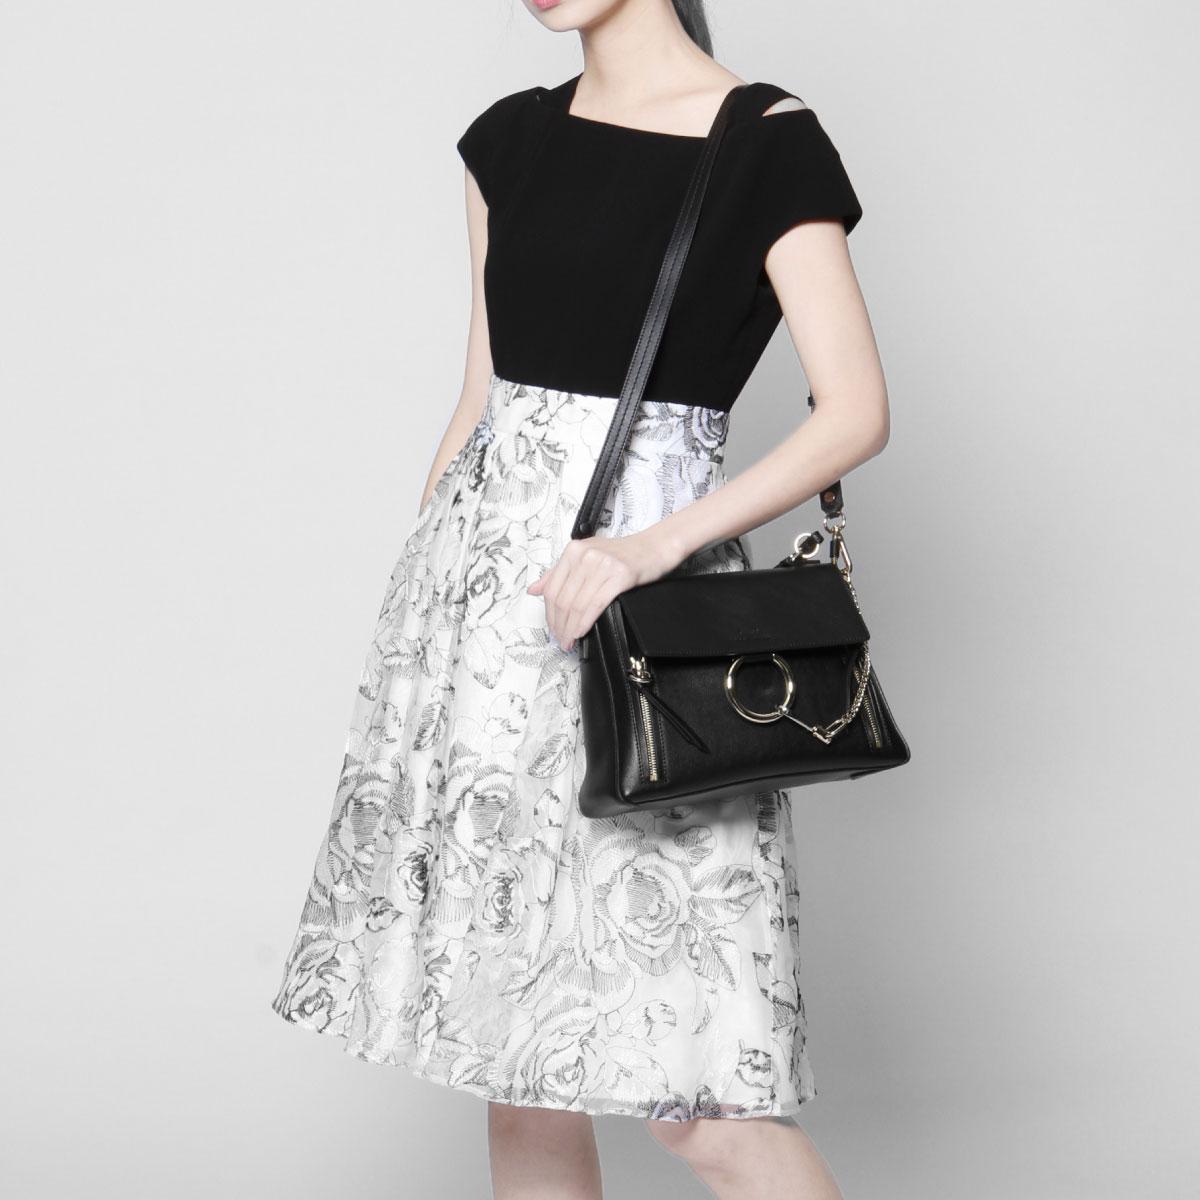 ce98468f15 Kuroe CHLOE bag lady C17WS322 HGJ 001 shoulder handbag Small FAYE DAY Fay D  BLACK black belonging to